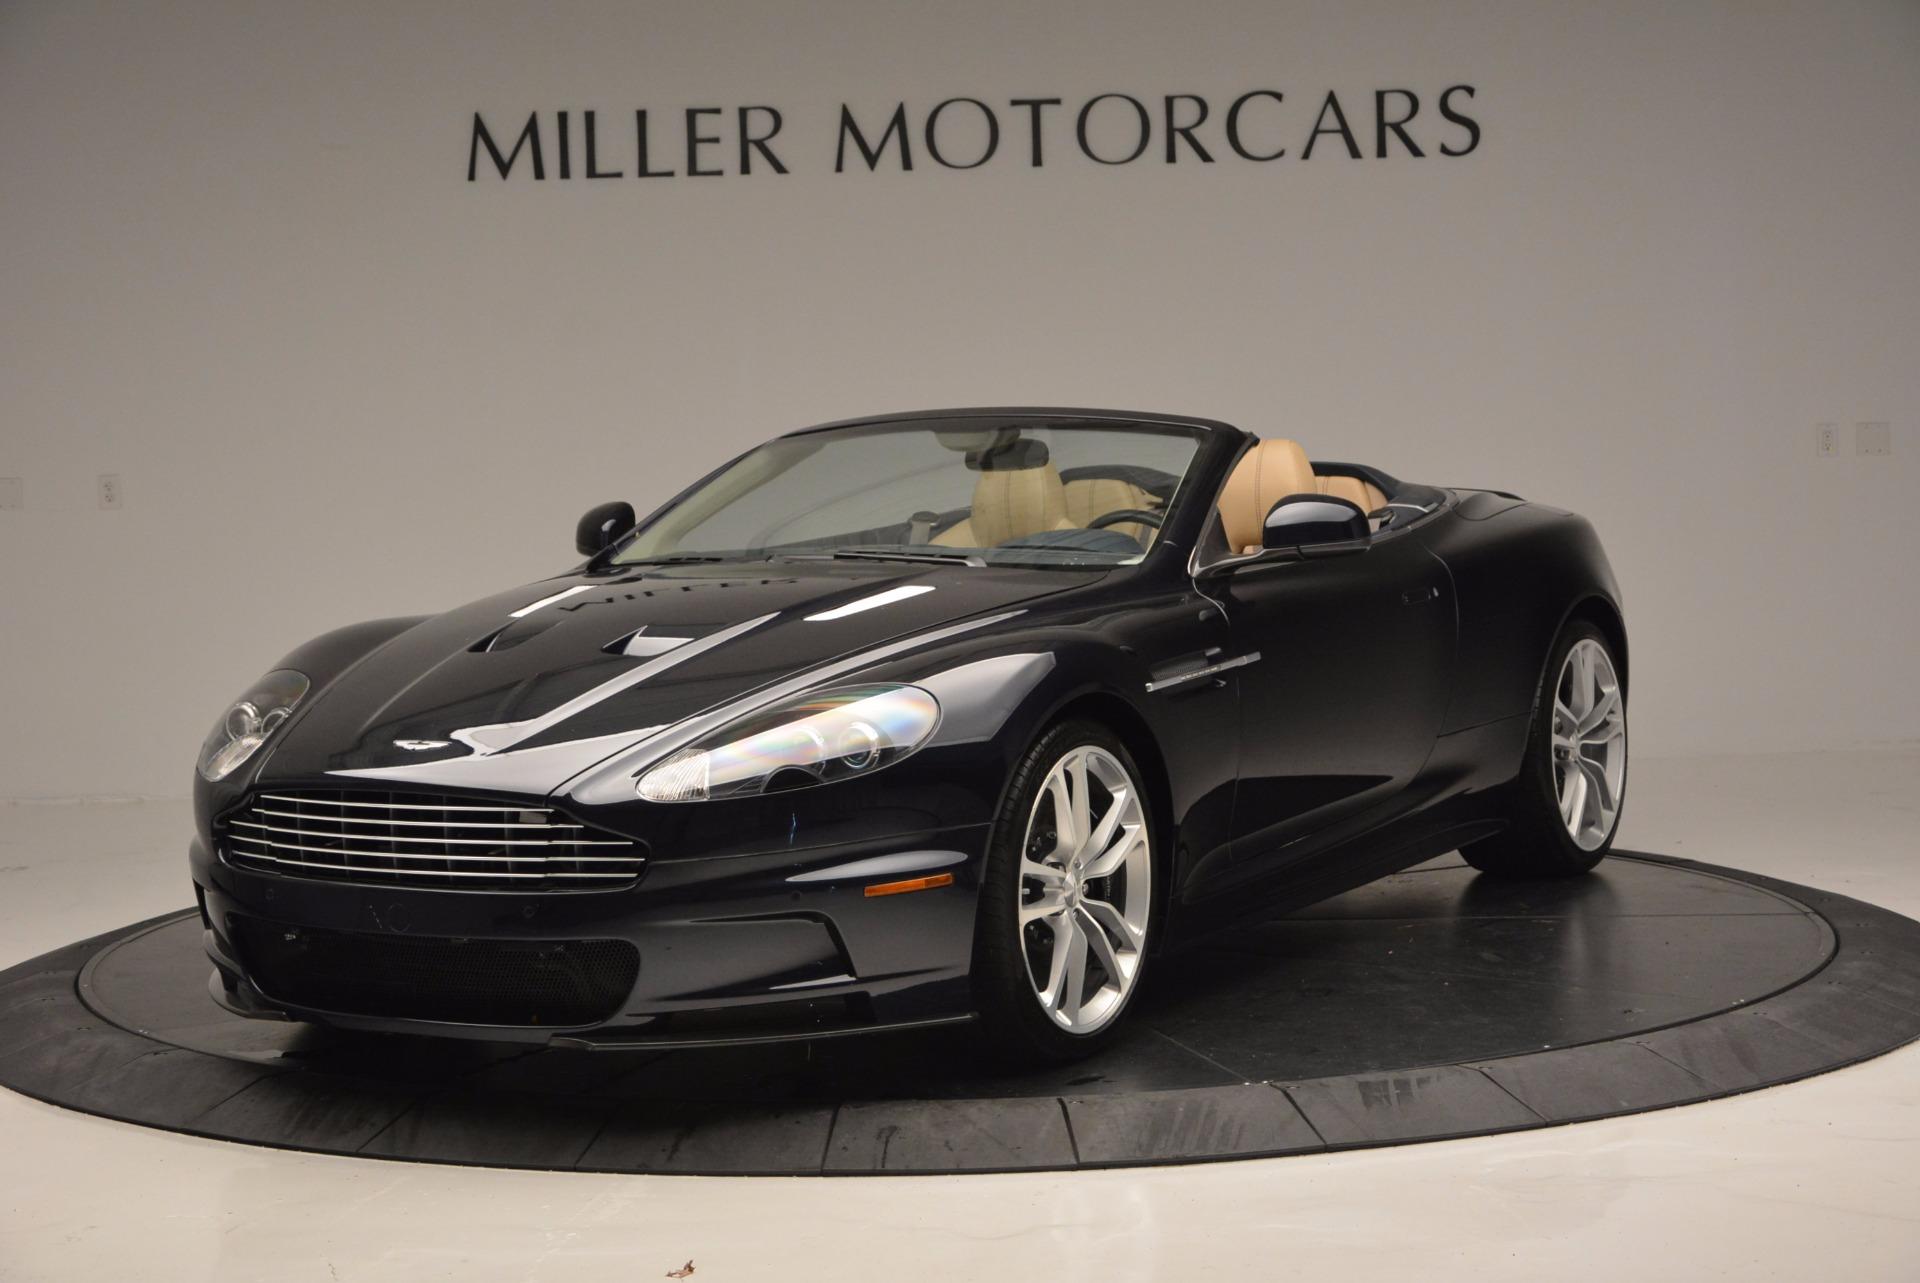 Used 2012 Aston Martin DBS Volante For Sale In Greenwich, CT 644_main